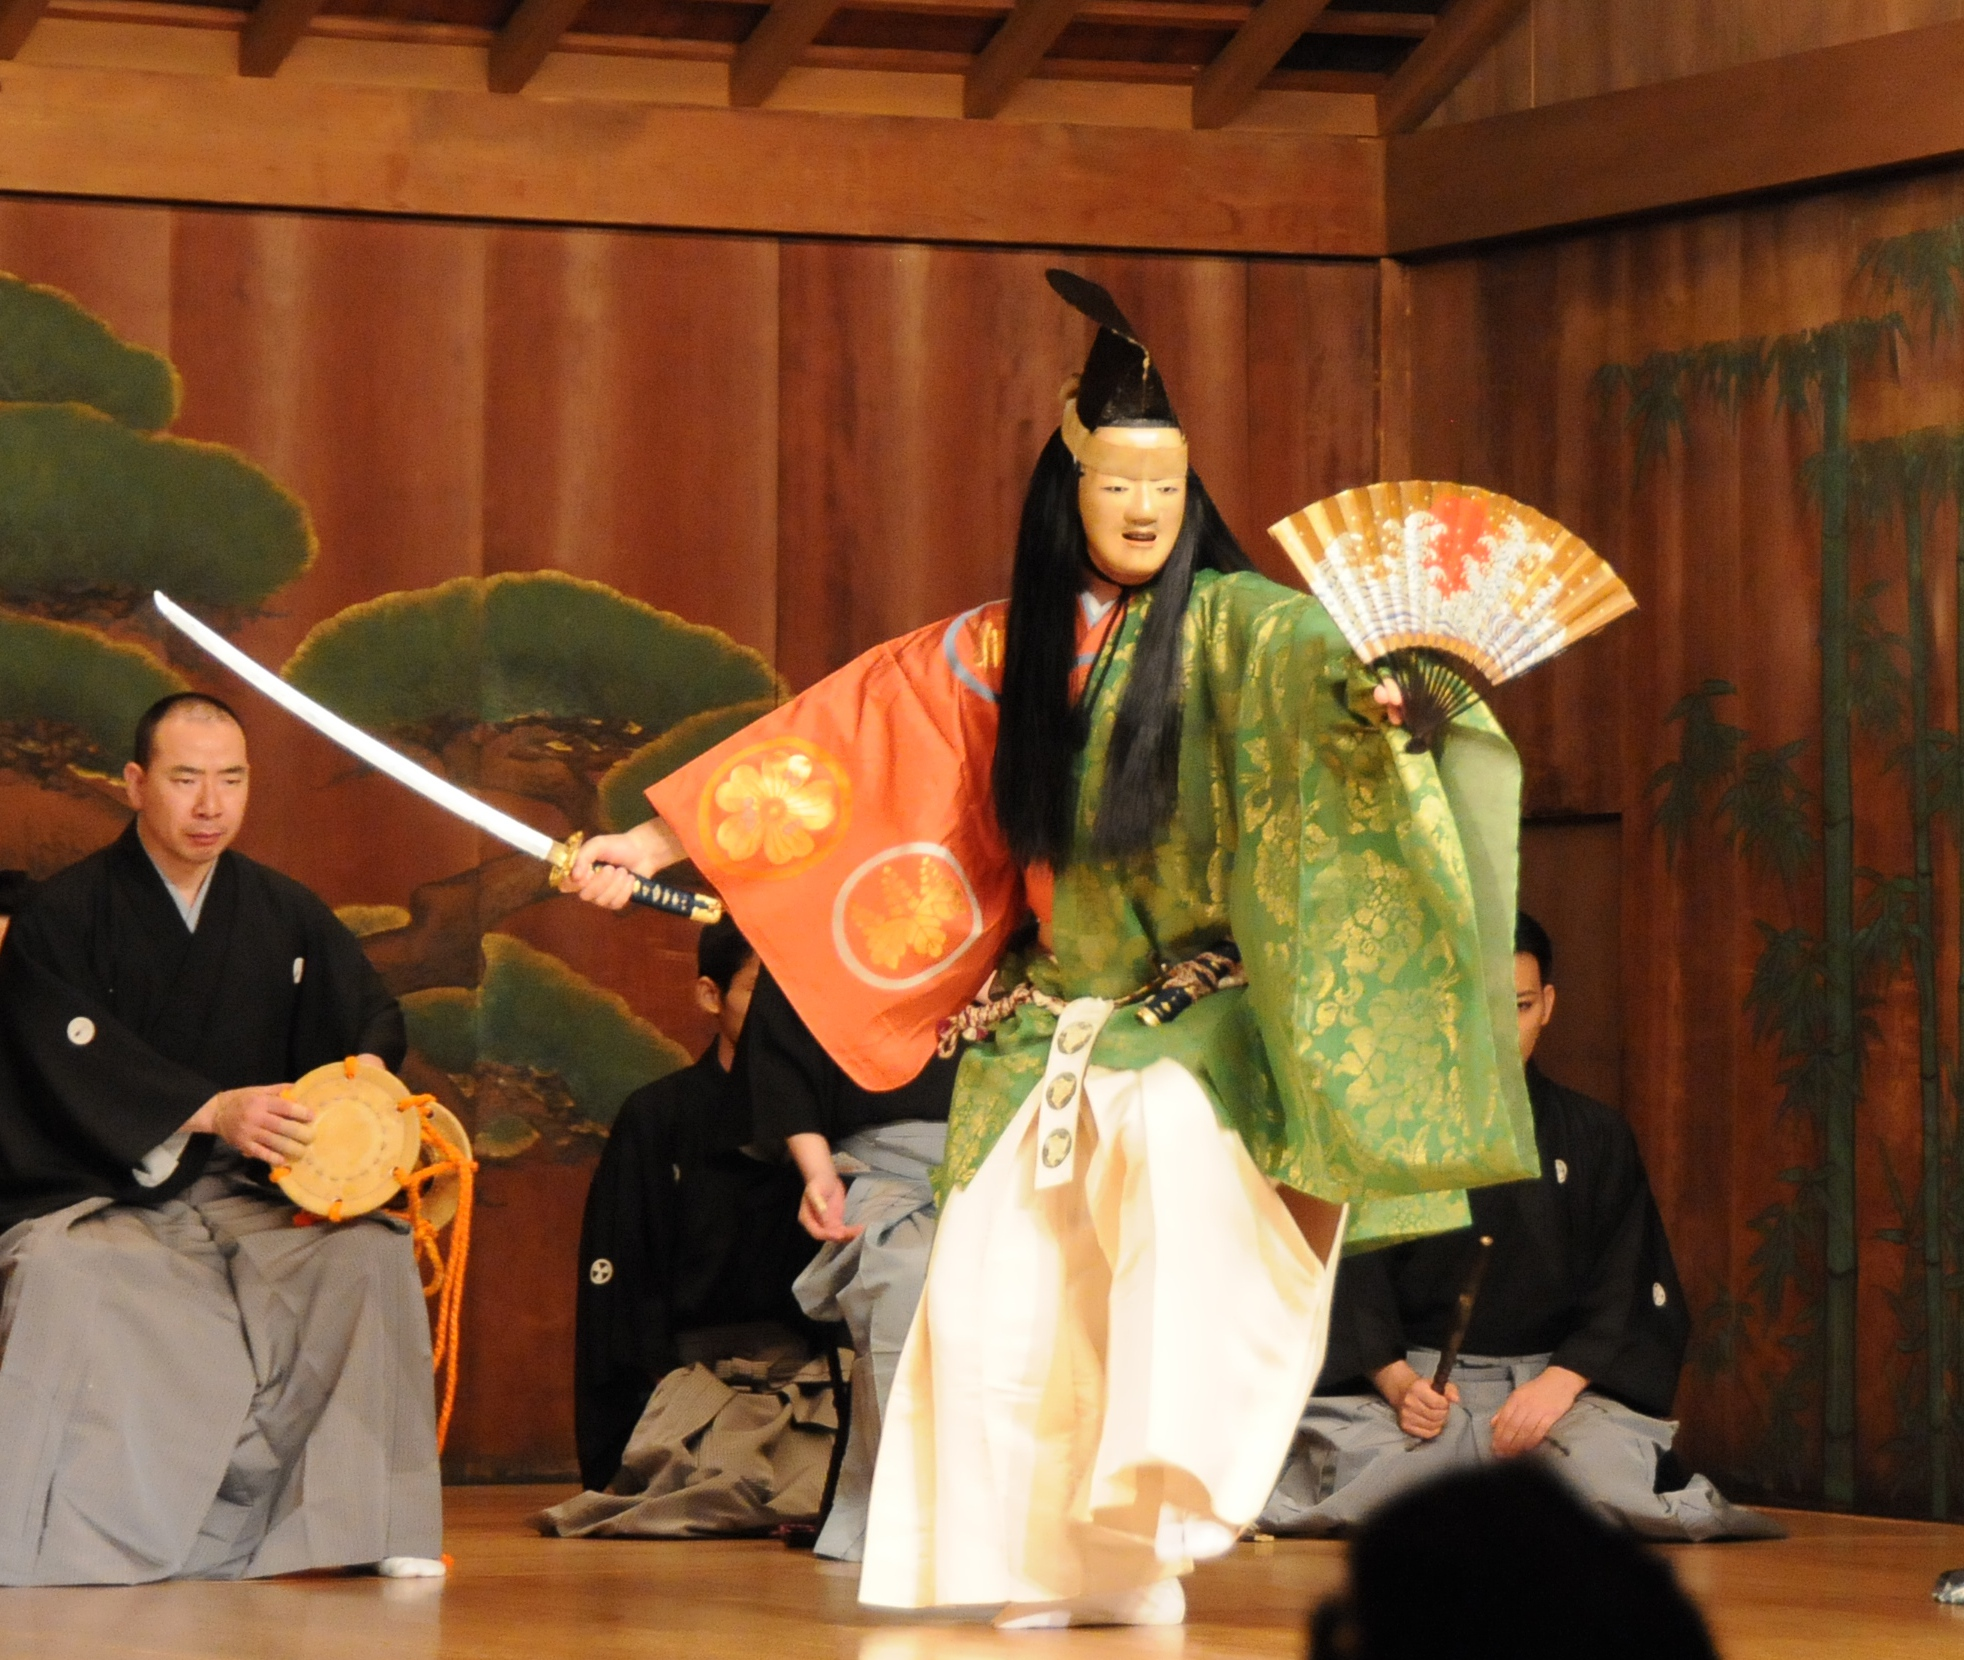 kiyotsune fights his last battle in the afterworld